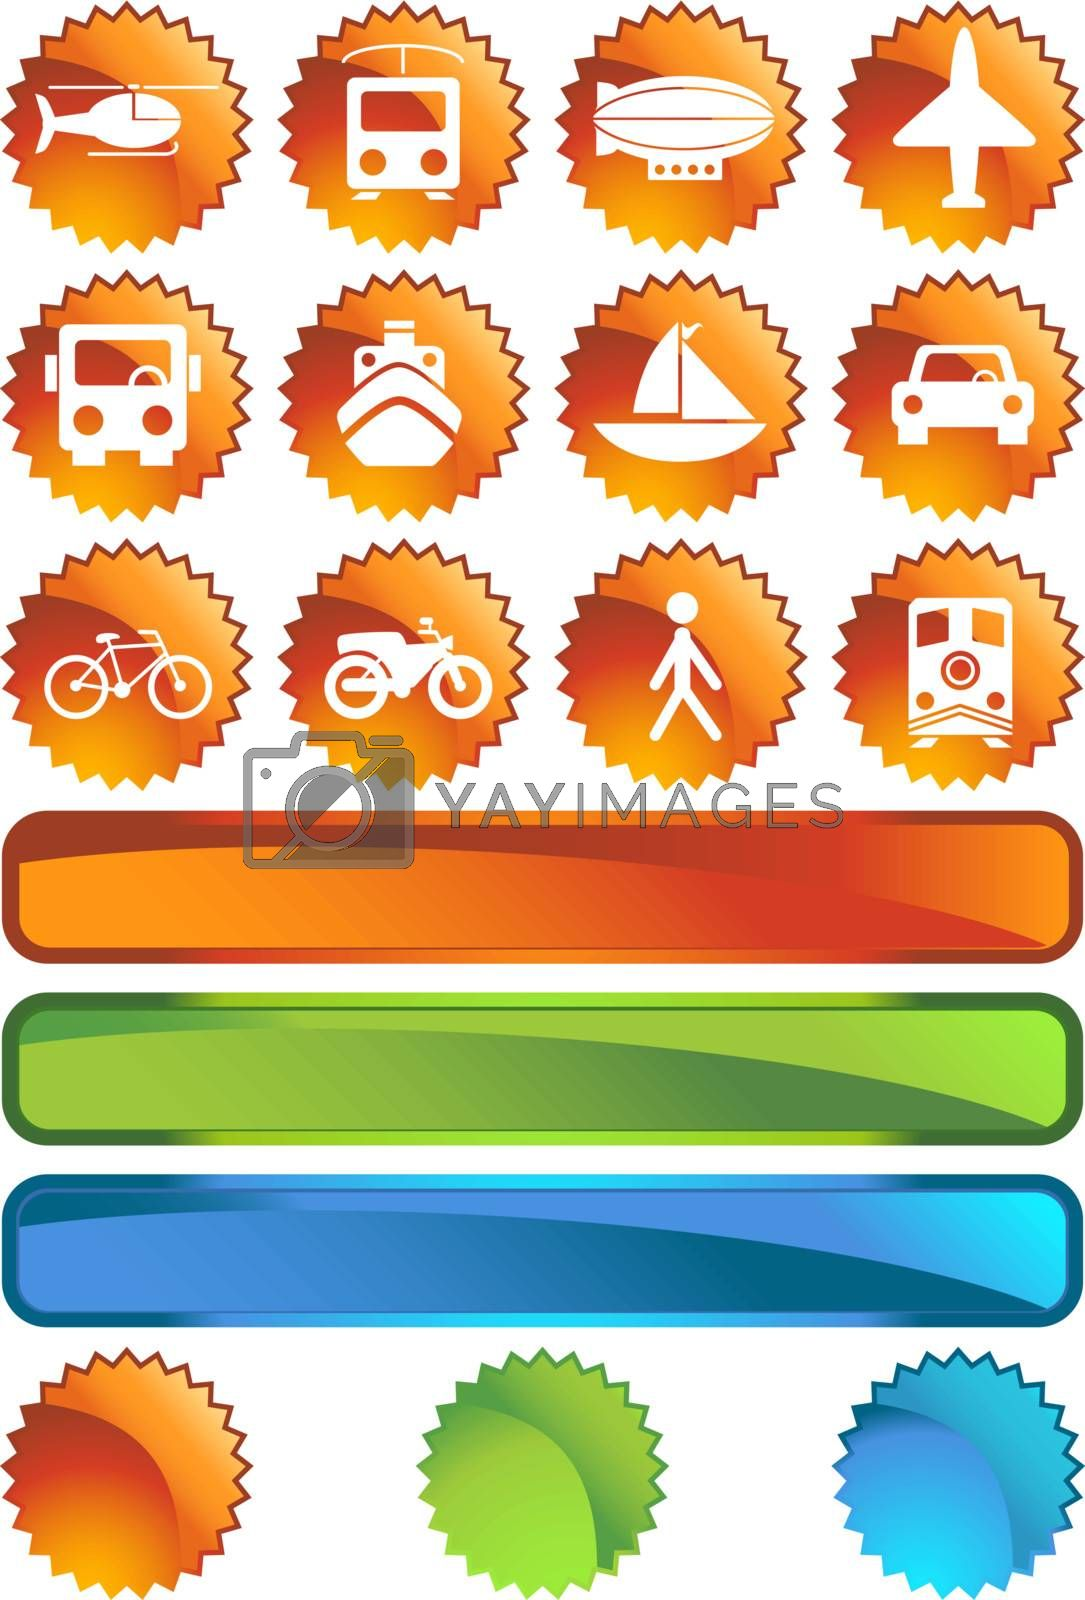 Set of 12 transportation web buttons - label style.